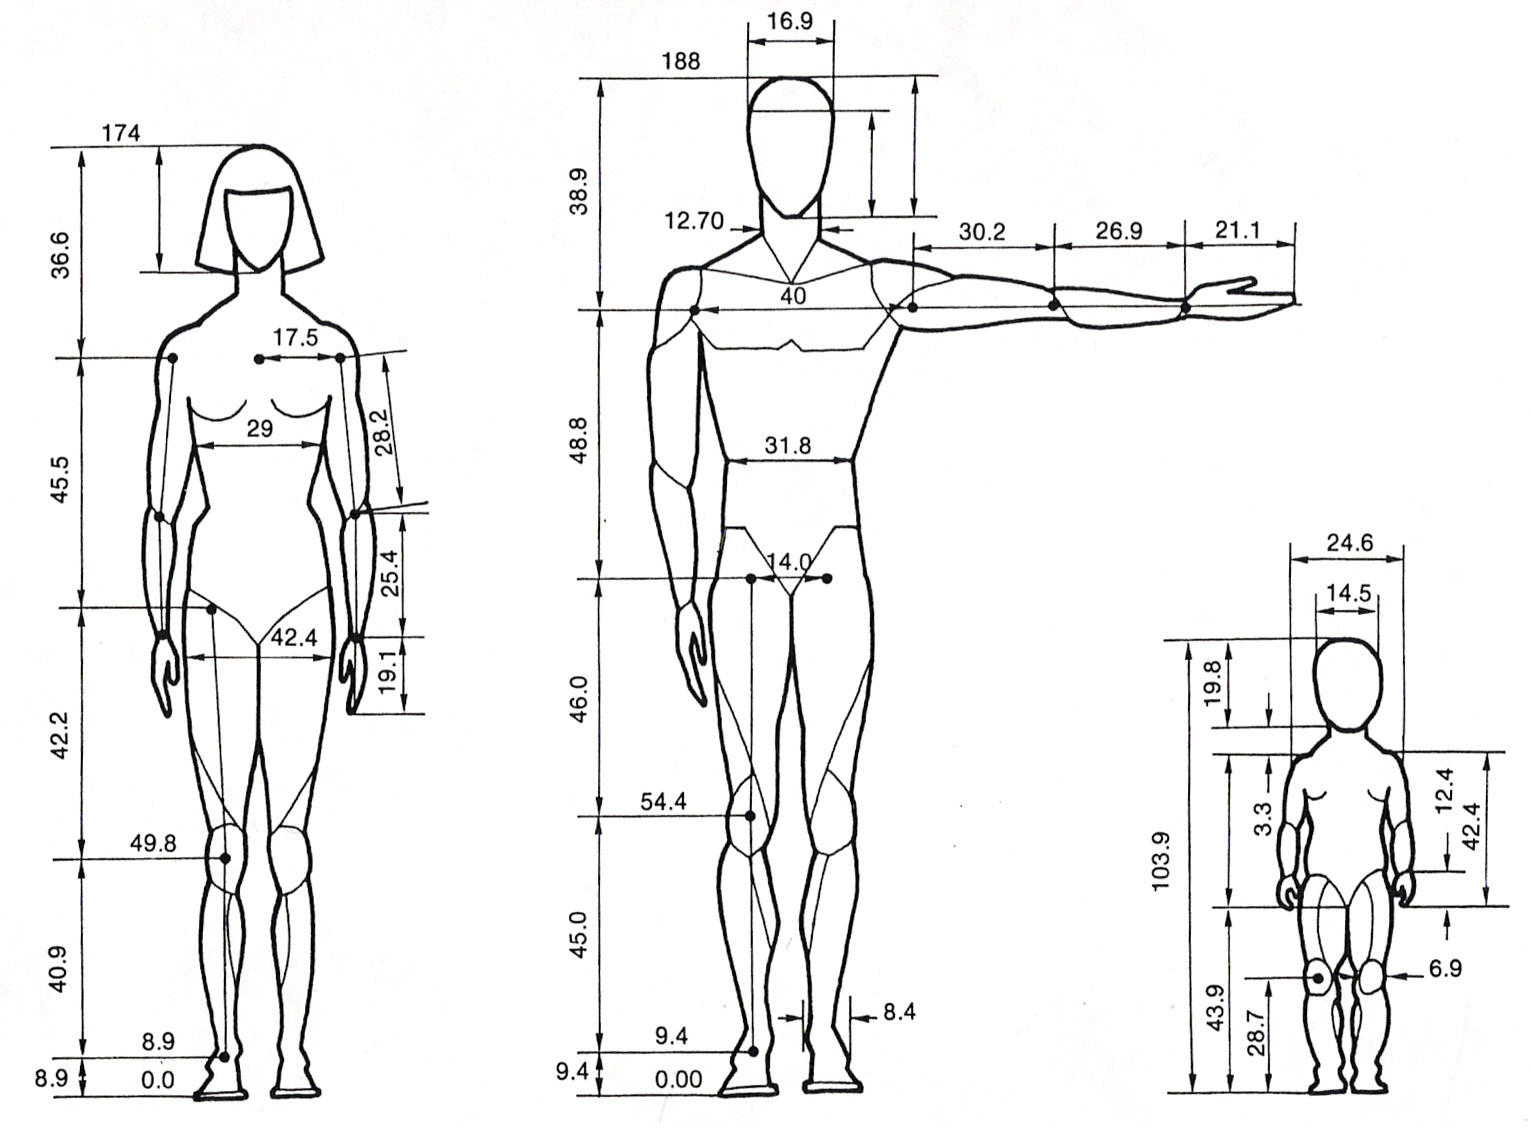 Human proportions by BenTs sTock on DeviantArt : humanproportionsbybentsstock from bents-stock.deviantart.com size 1531 x 1128 jpeg 228kB